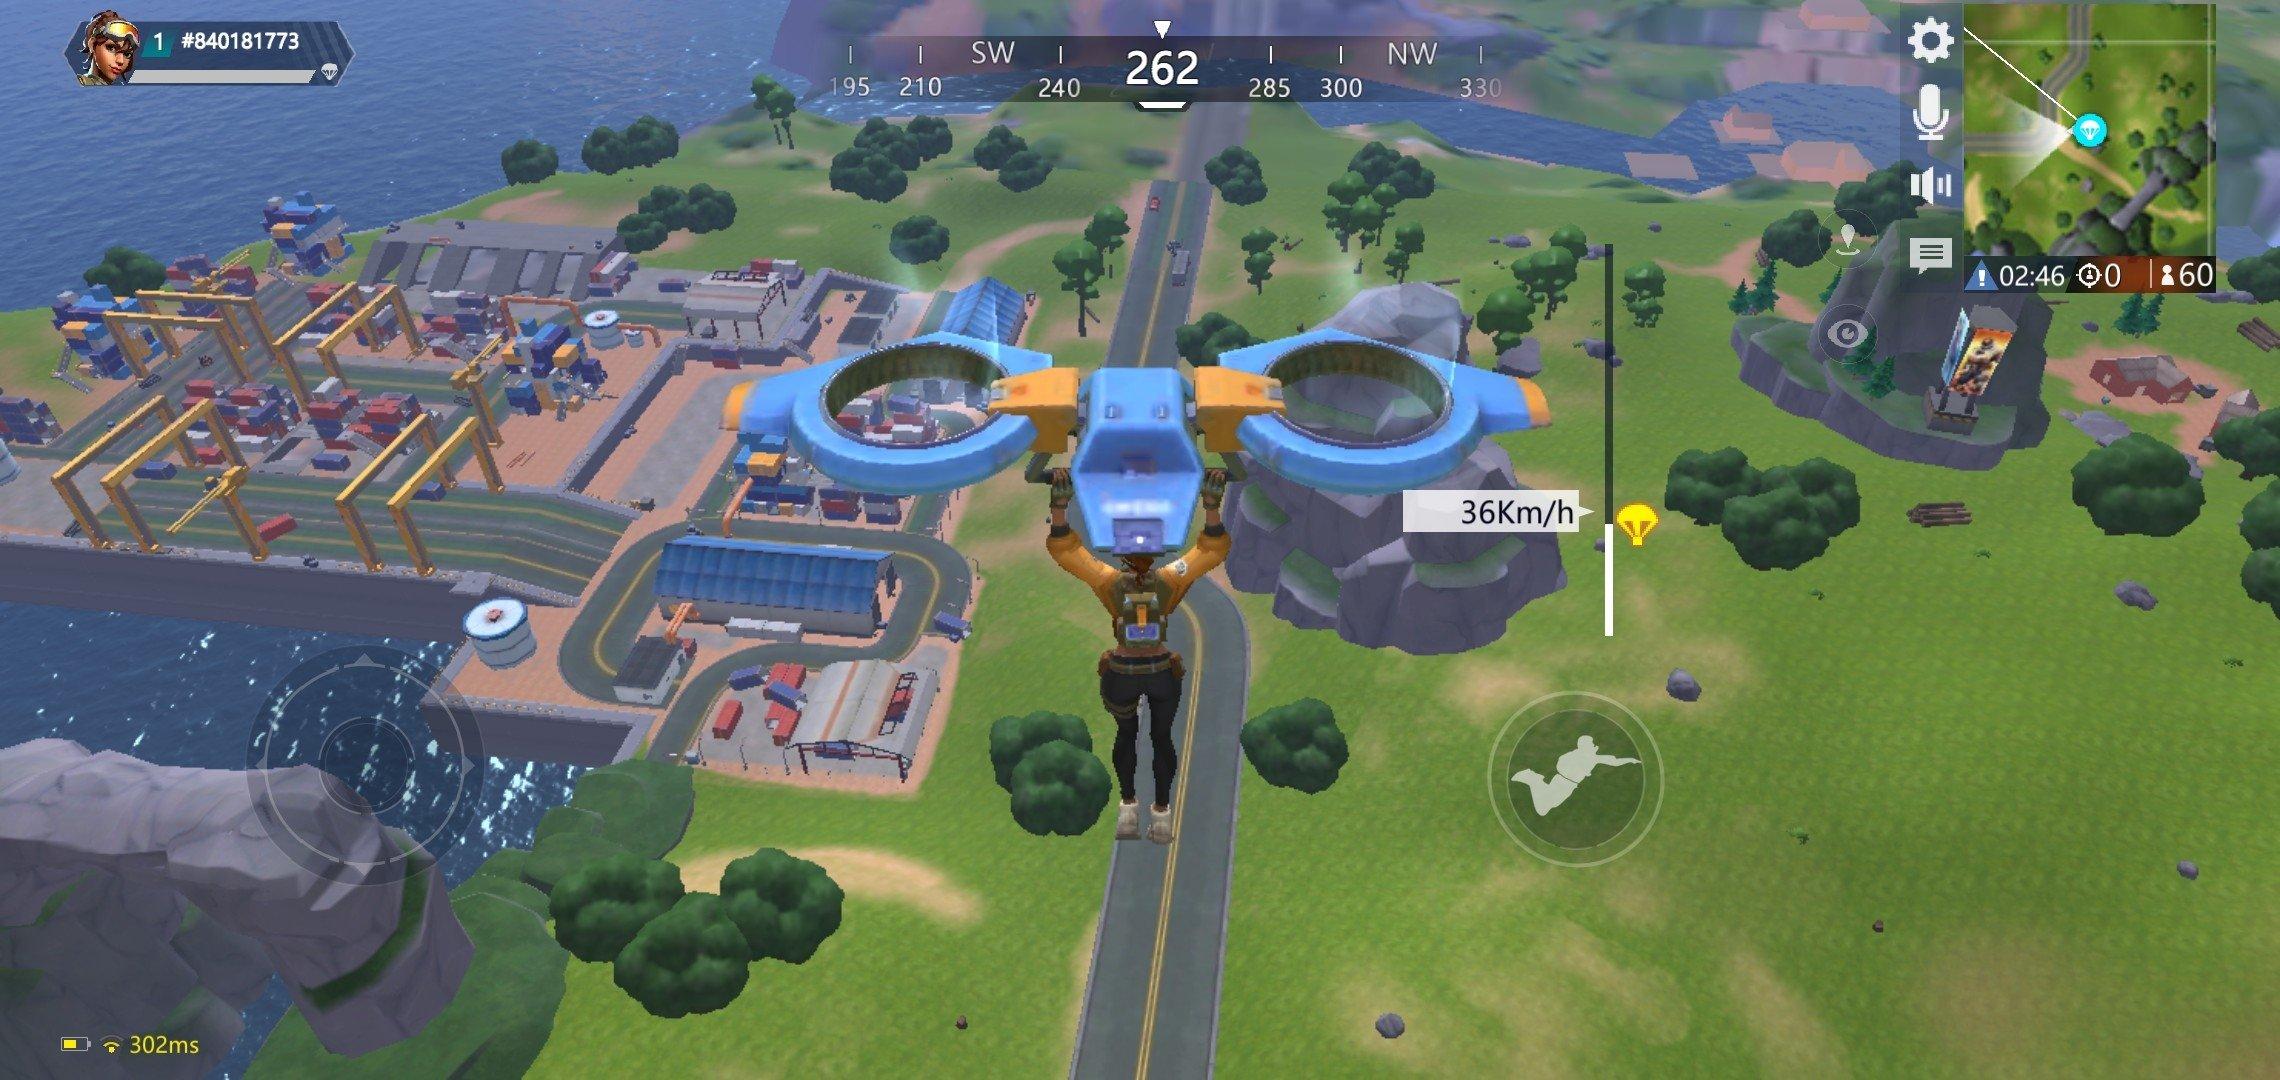 Omega Legends 1.0.15 - Descargar para Android APK Gratis